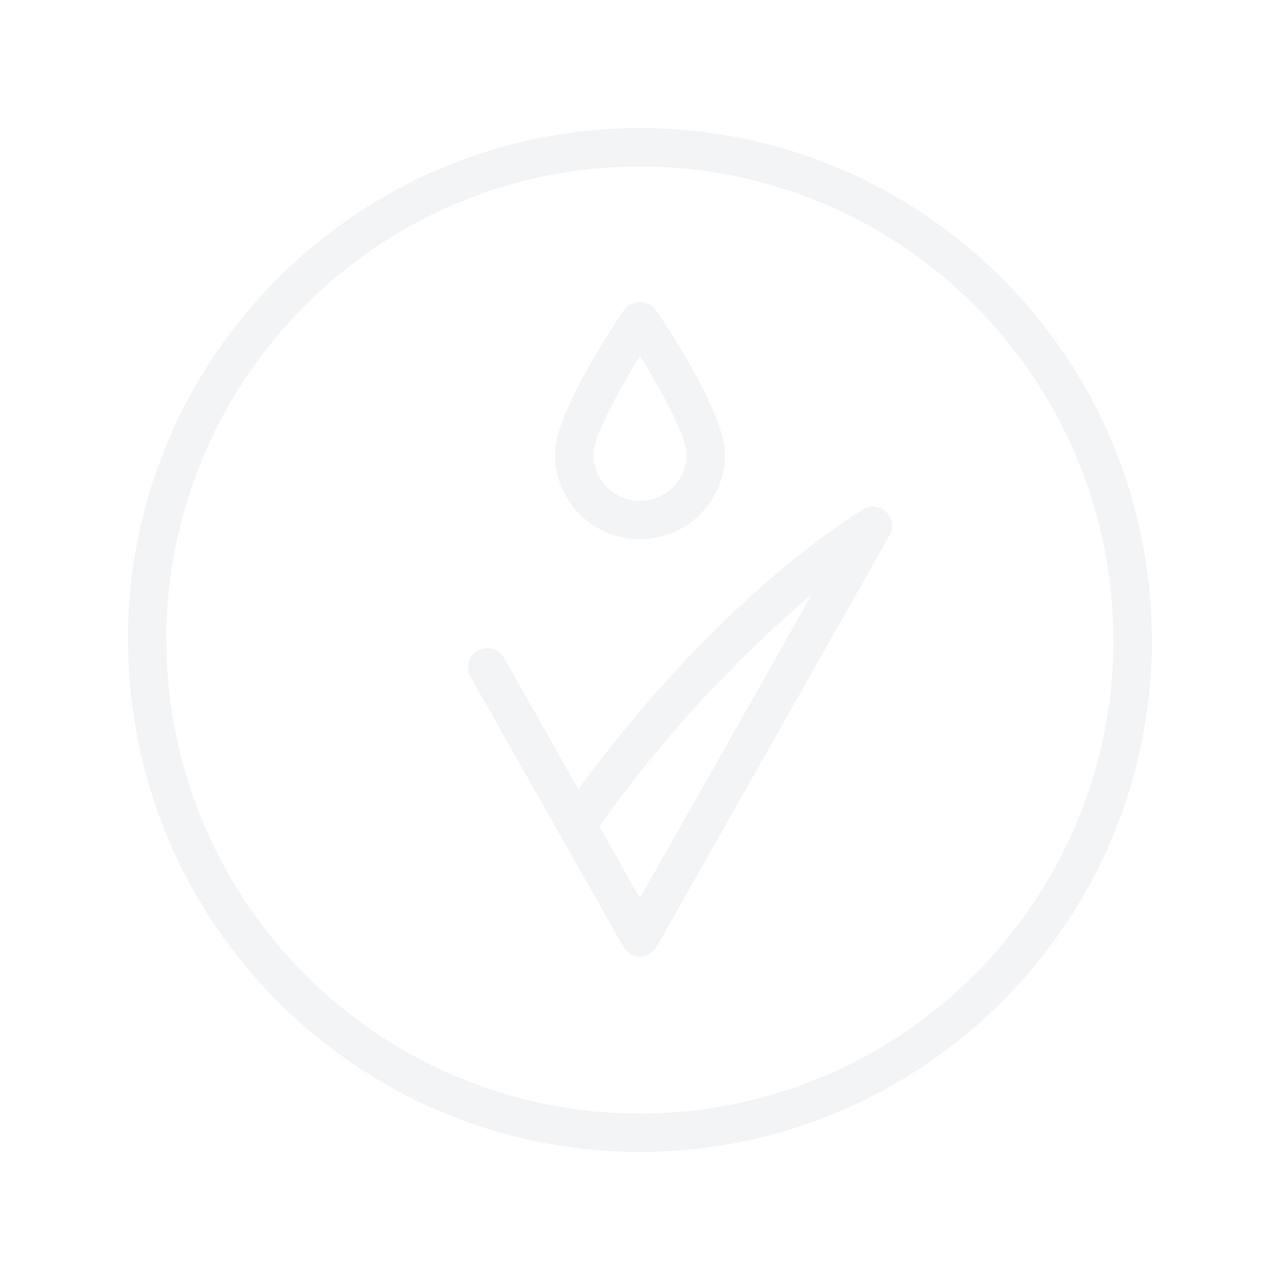 L'OREAL Brow Artist Maker  крем-карандаш для бровей 1.5g